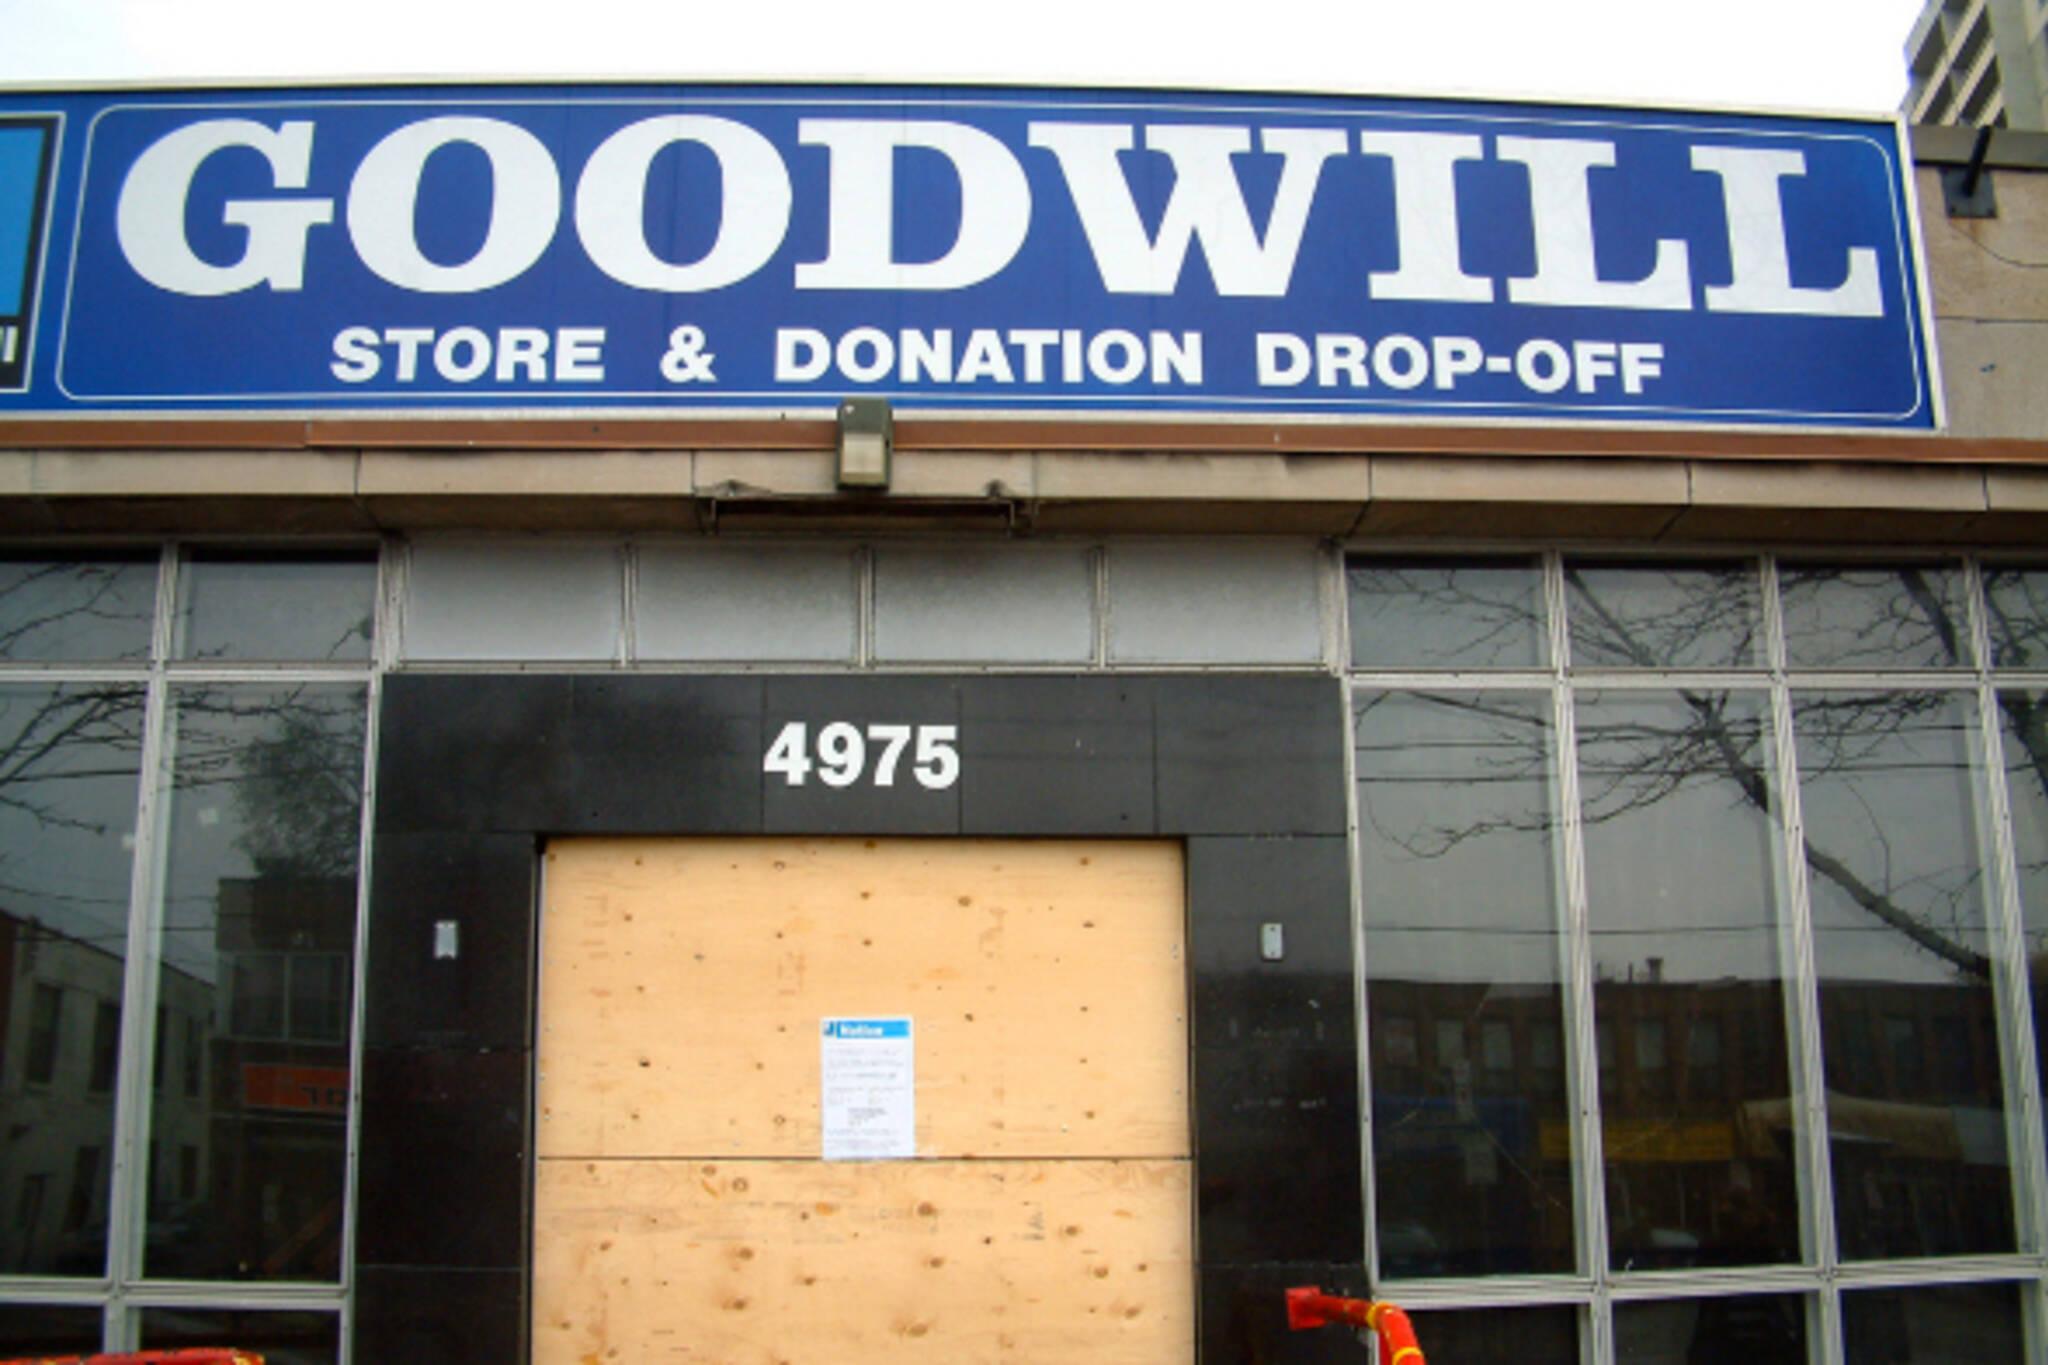 Goodwill Toronto